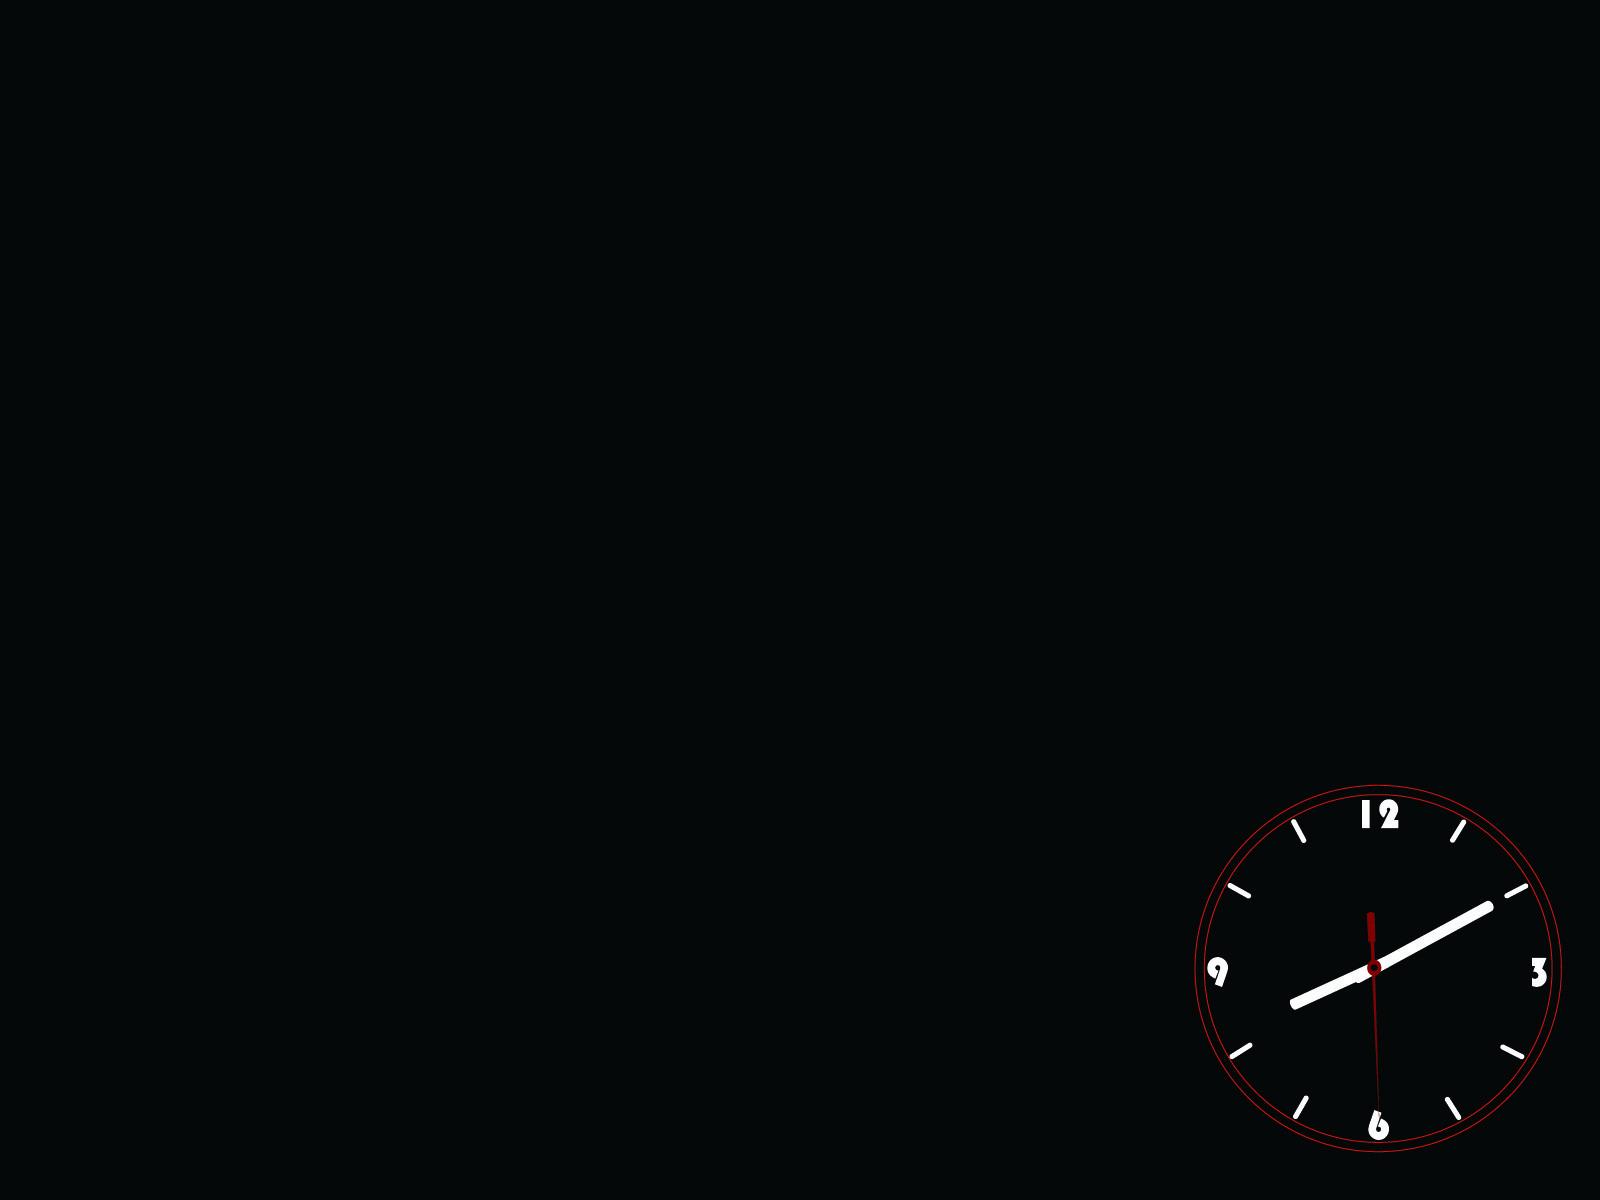 Black Clock PPT Backgrounds